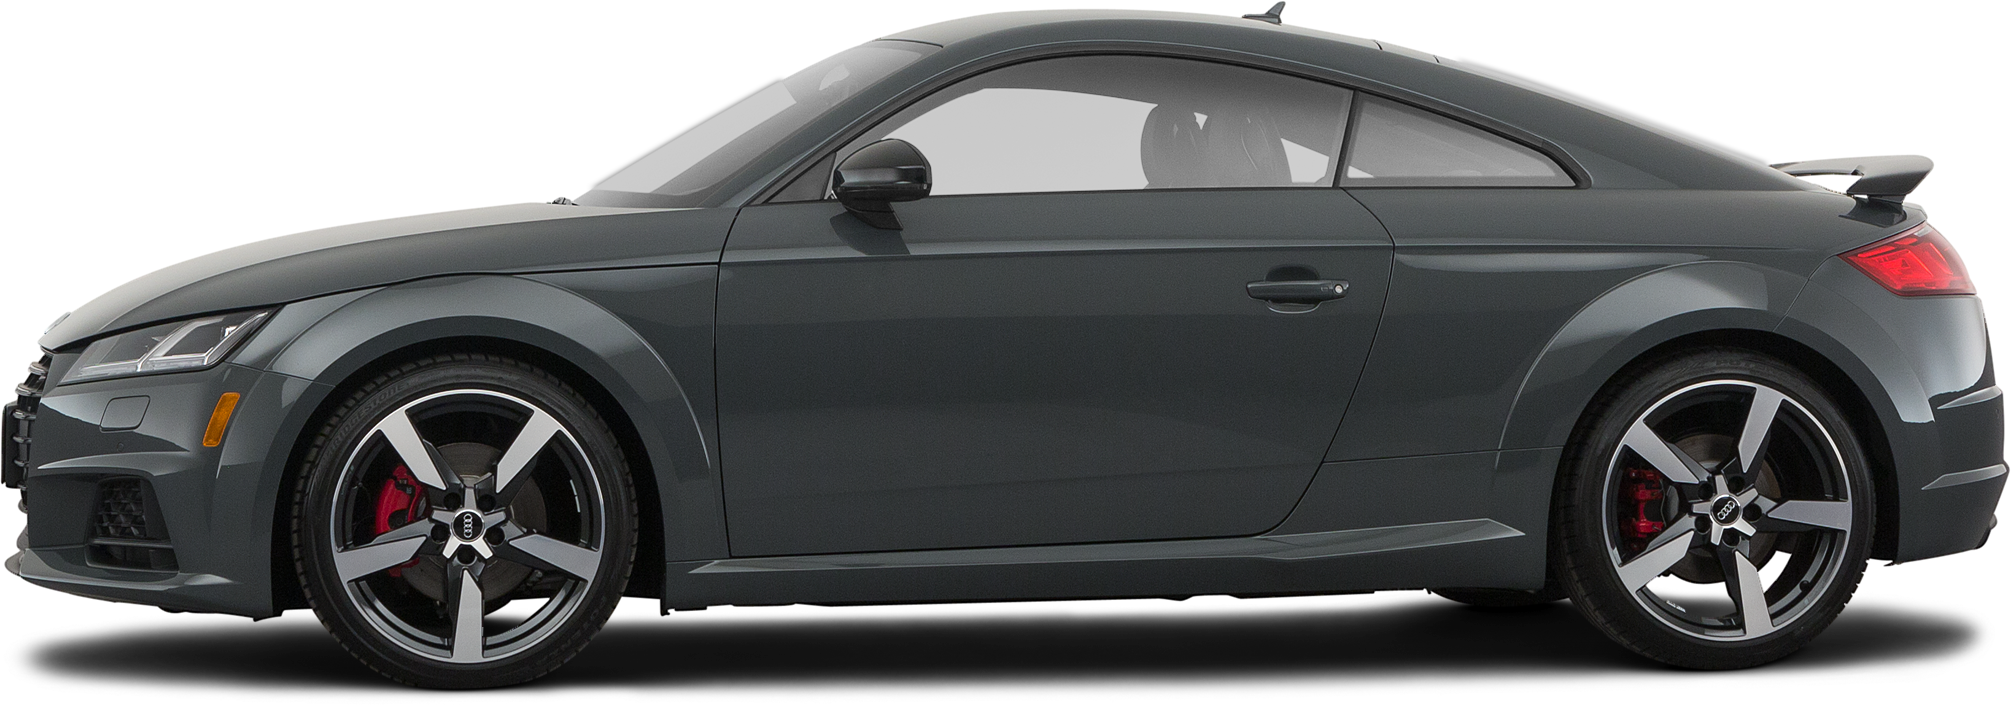 2020 Audi TT Coupe 45